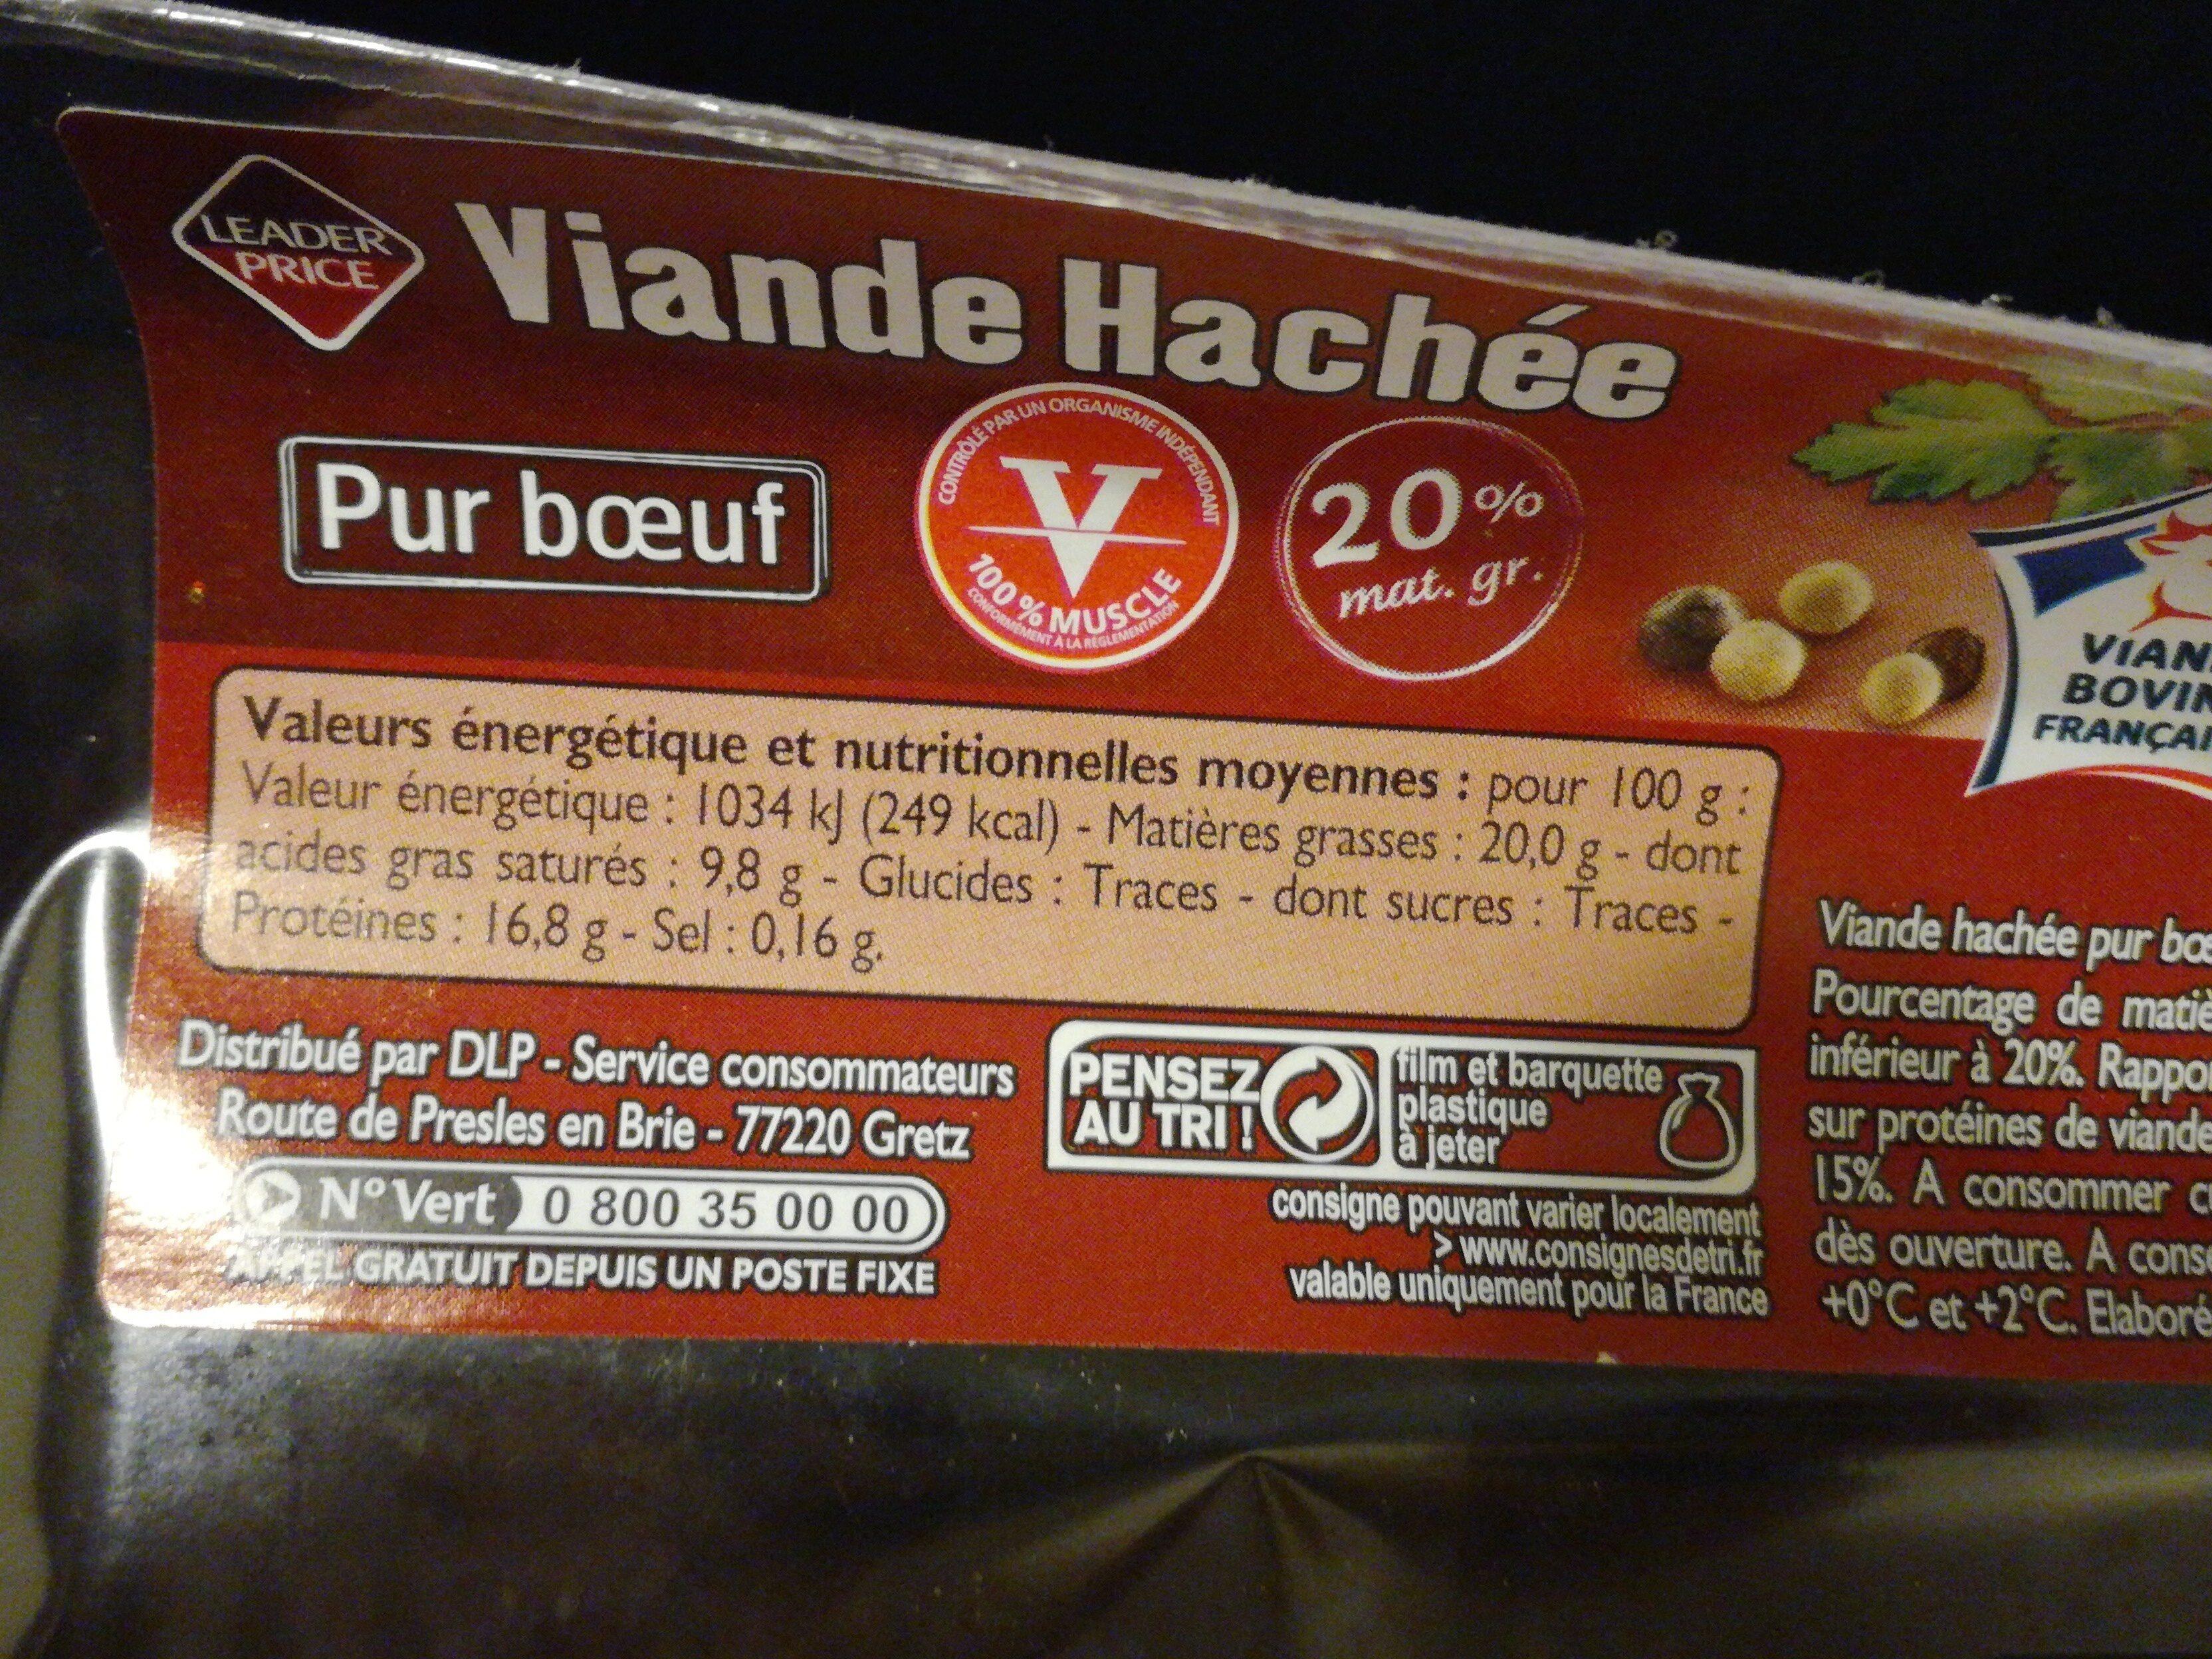 Viande hachée pur boeuf 20% mat. Gr. - Ingrediënten